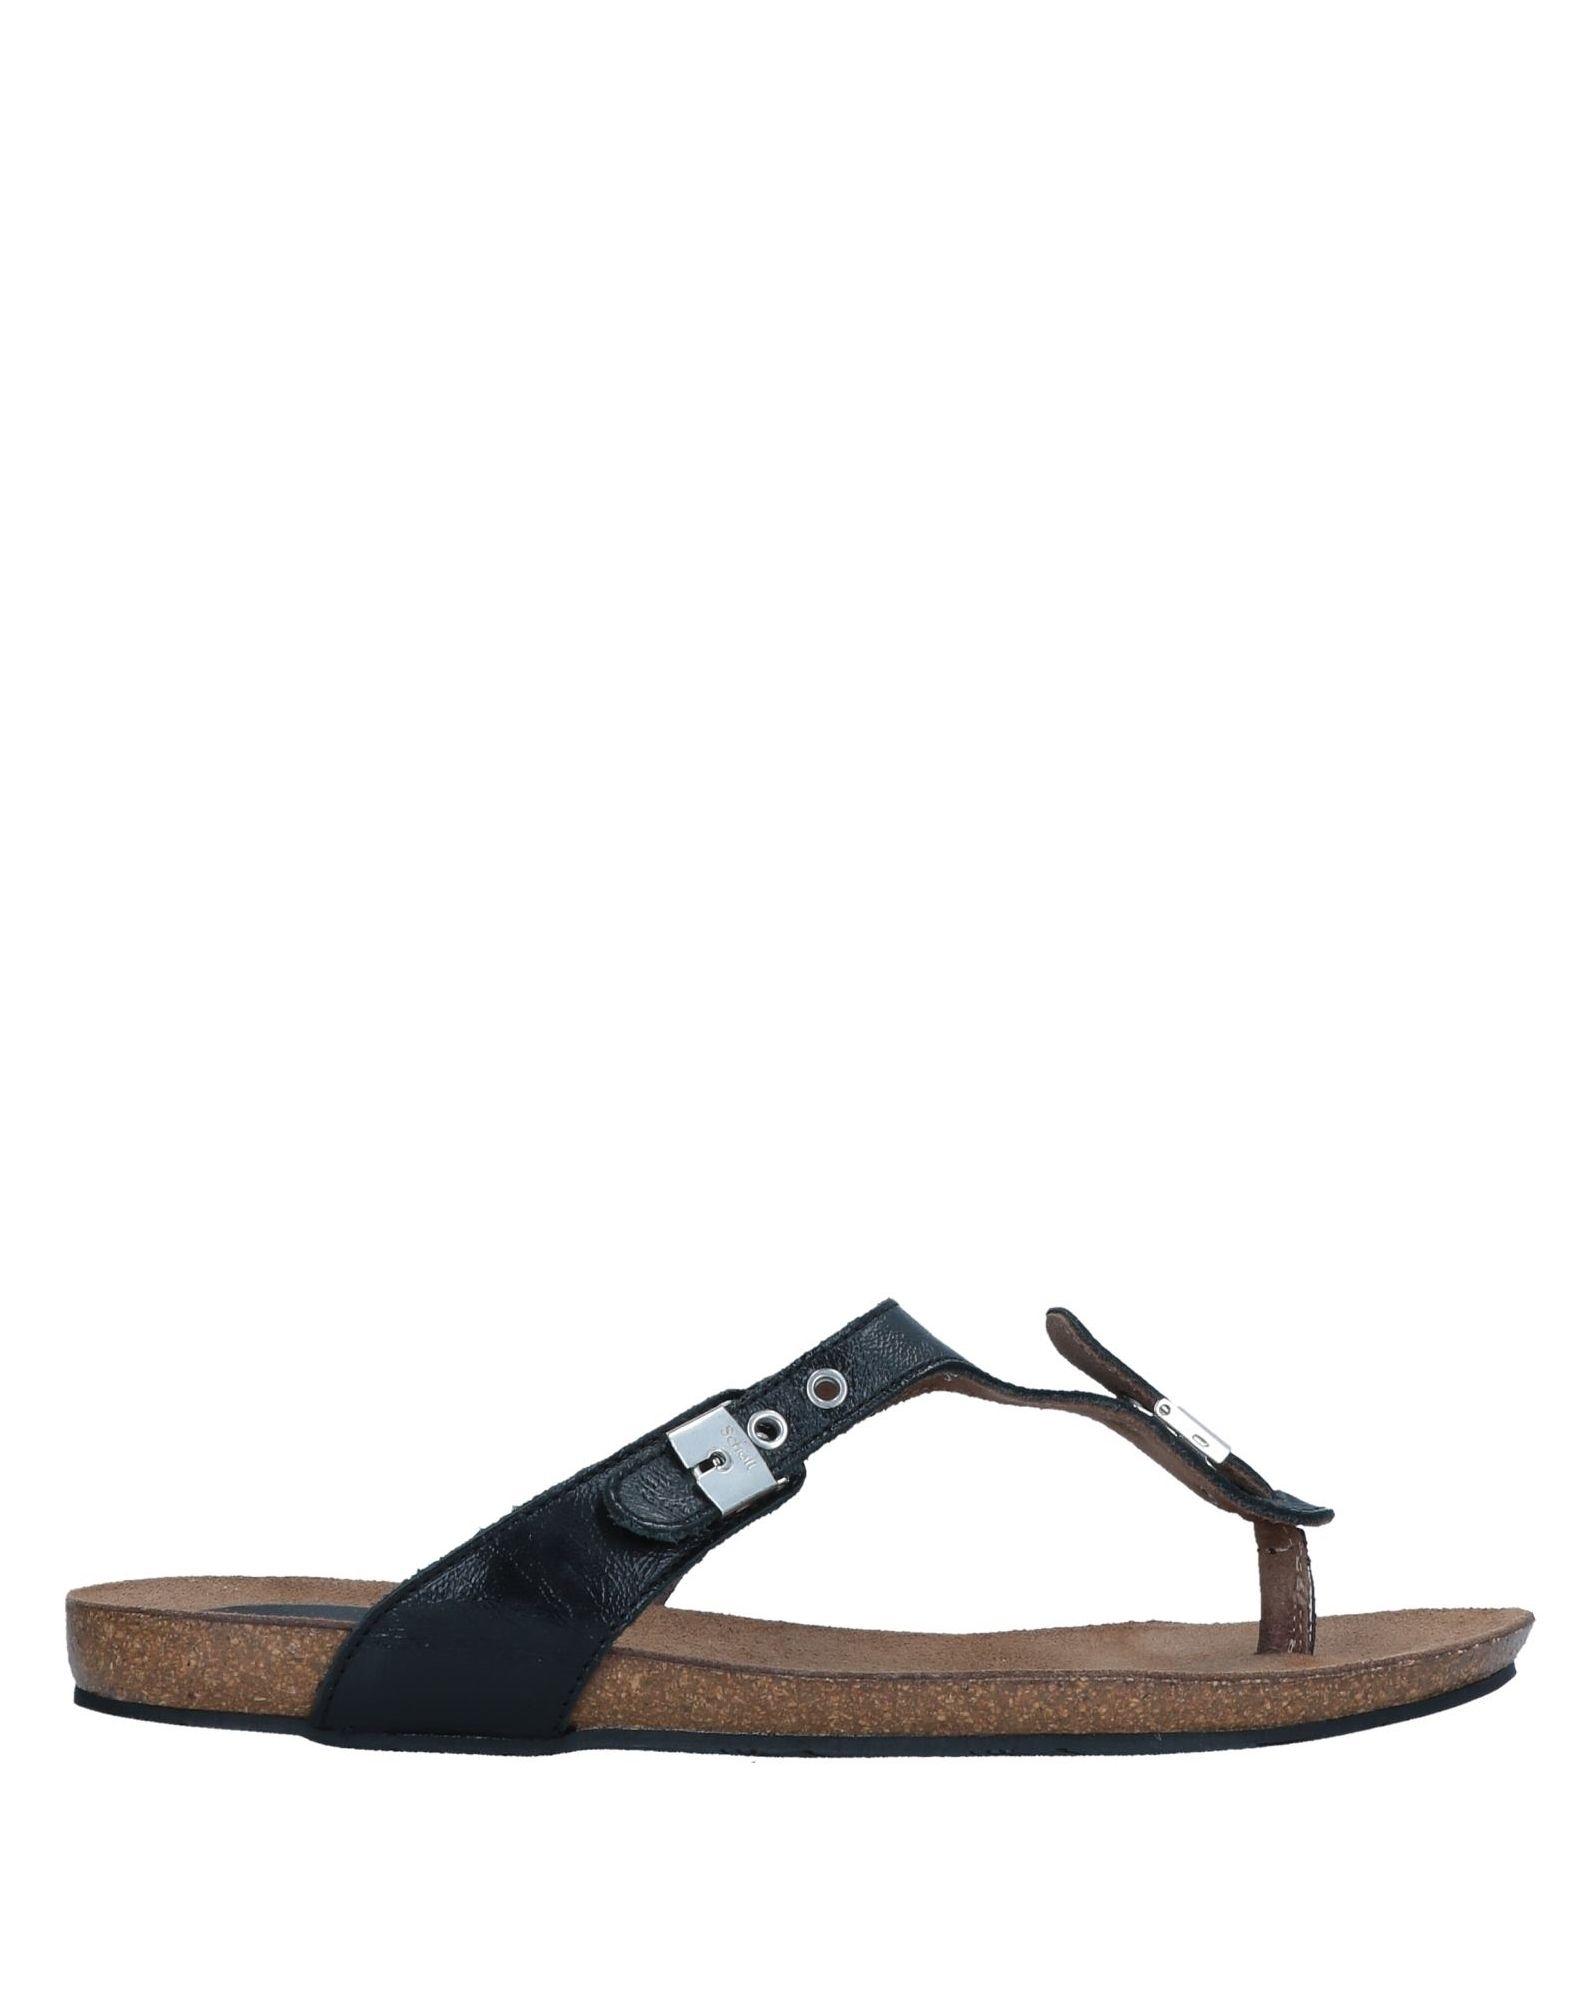 Scholl Dianetten Damen  11548612ON Gute Qualität beliebte Schuhe